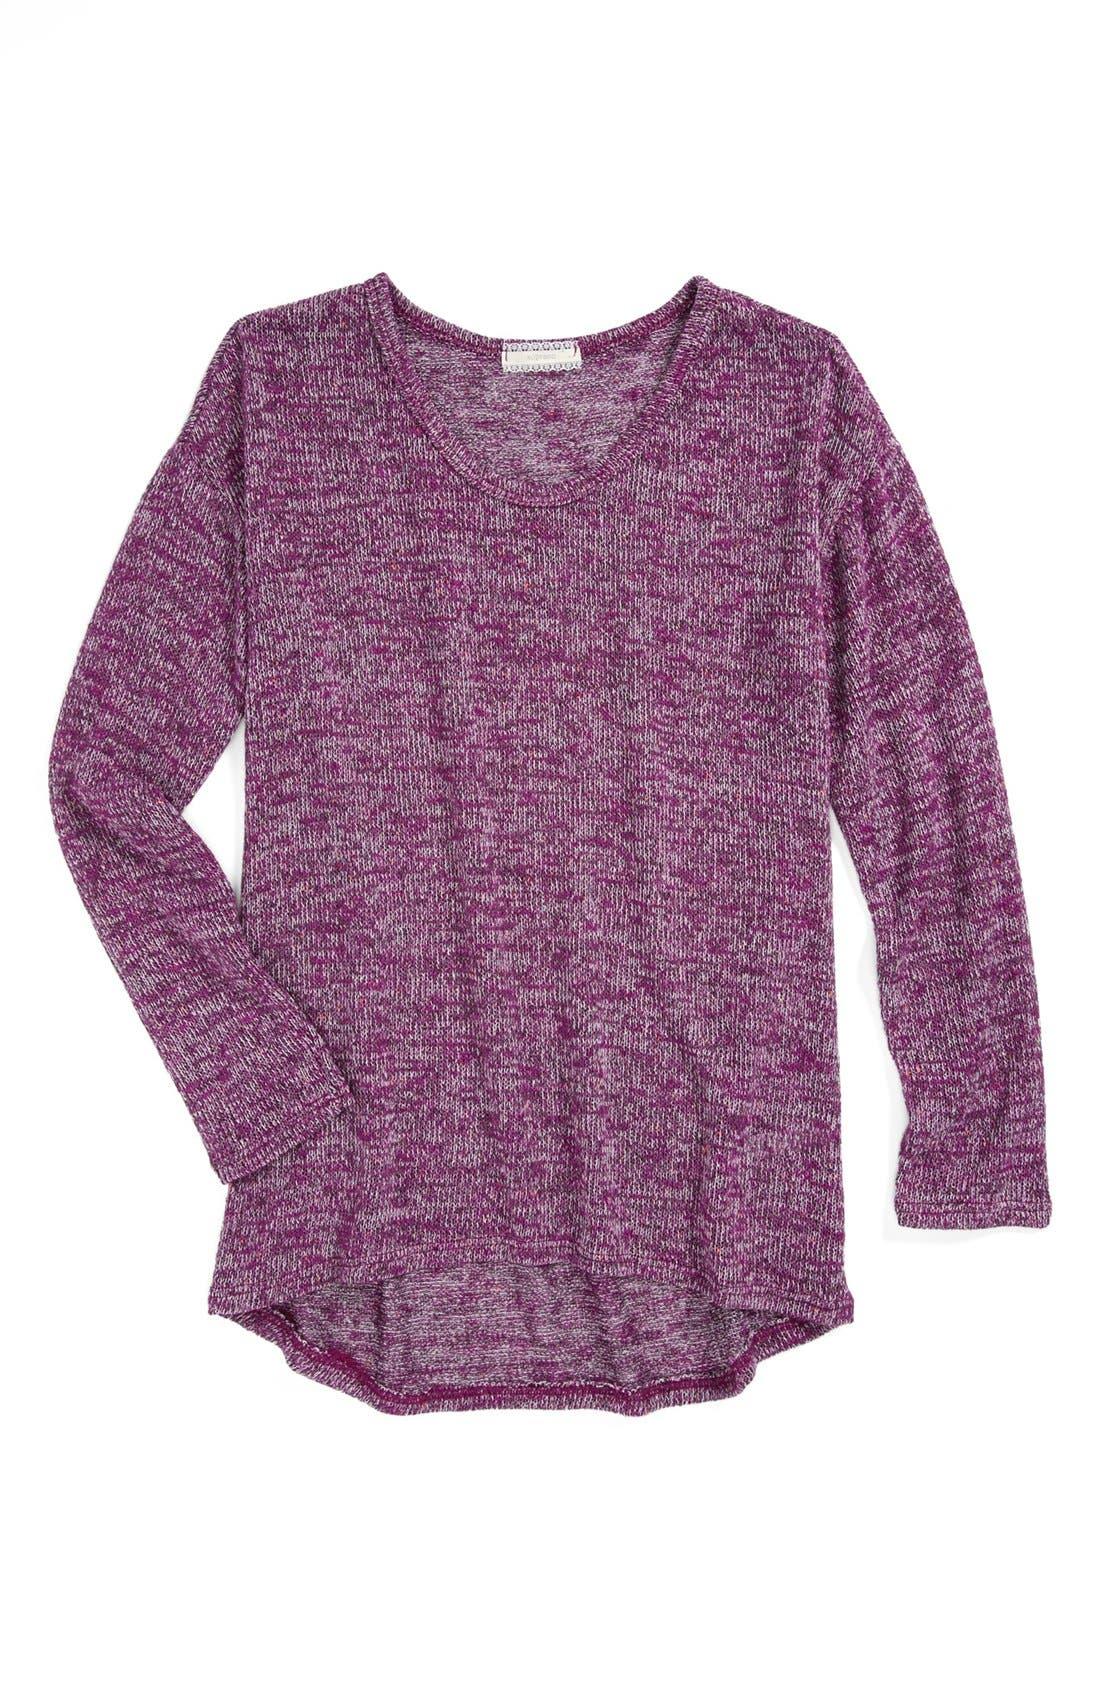 Alternate Image 1 Selected - Soprano Sweater (Little Girls & Big Girls)